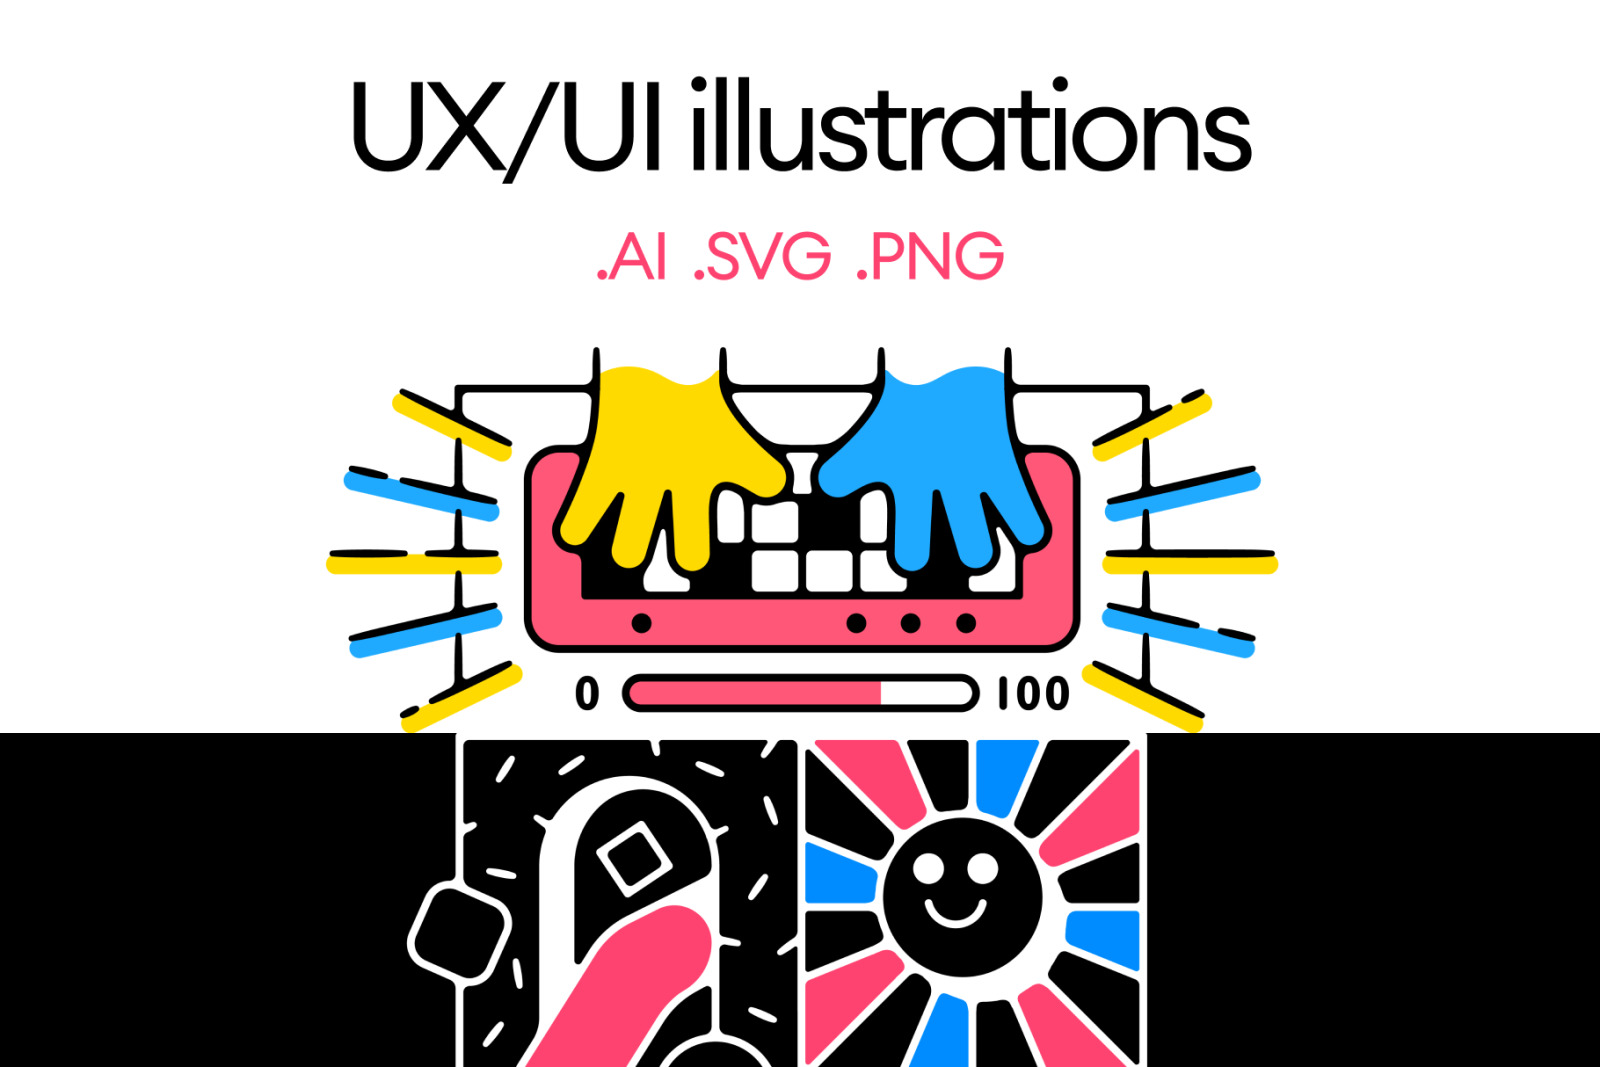 UX/UI Illustrations